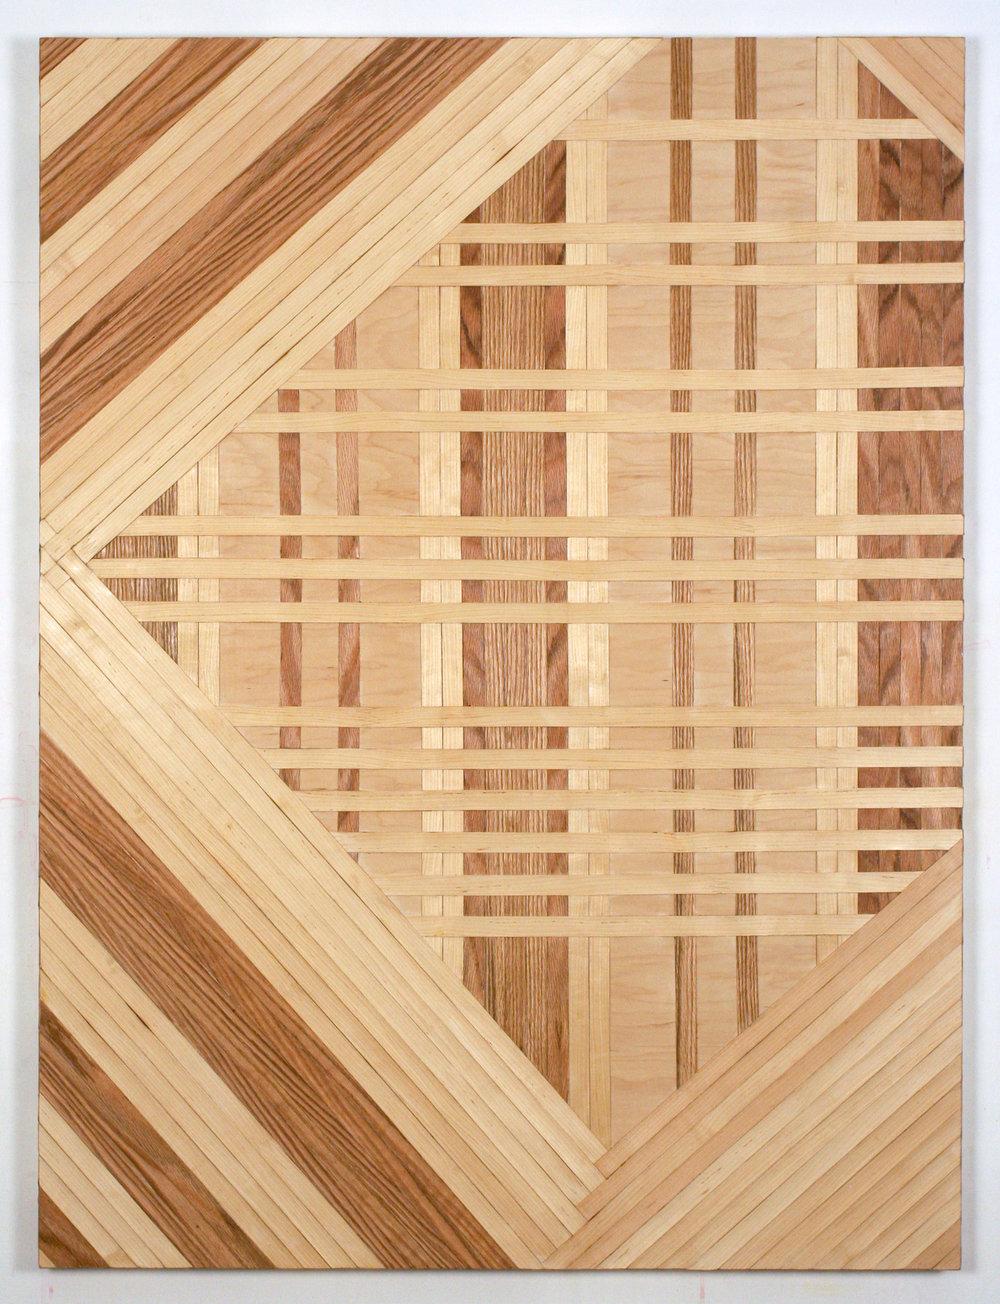 ideology  2016 red oak and birch veneer edge banding on panel  48 in x 36 in